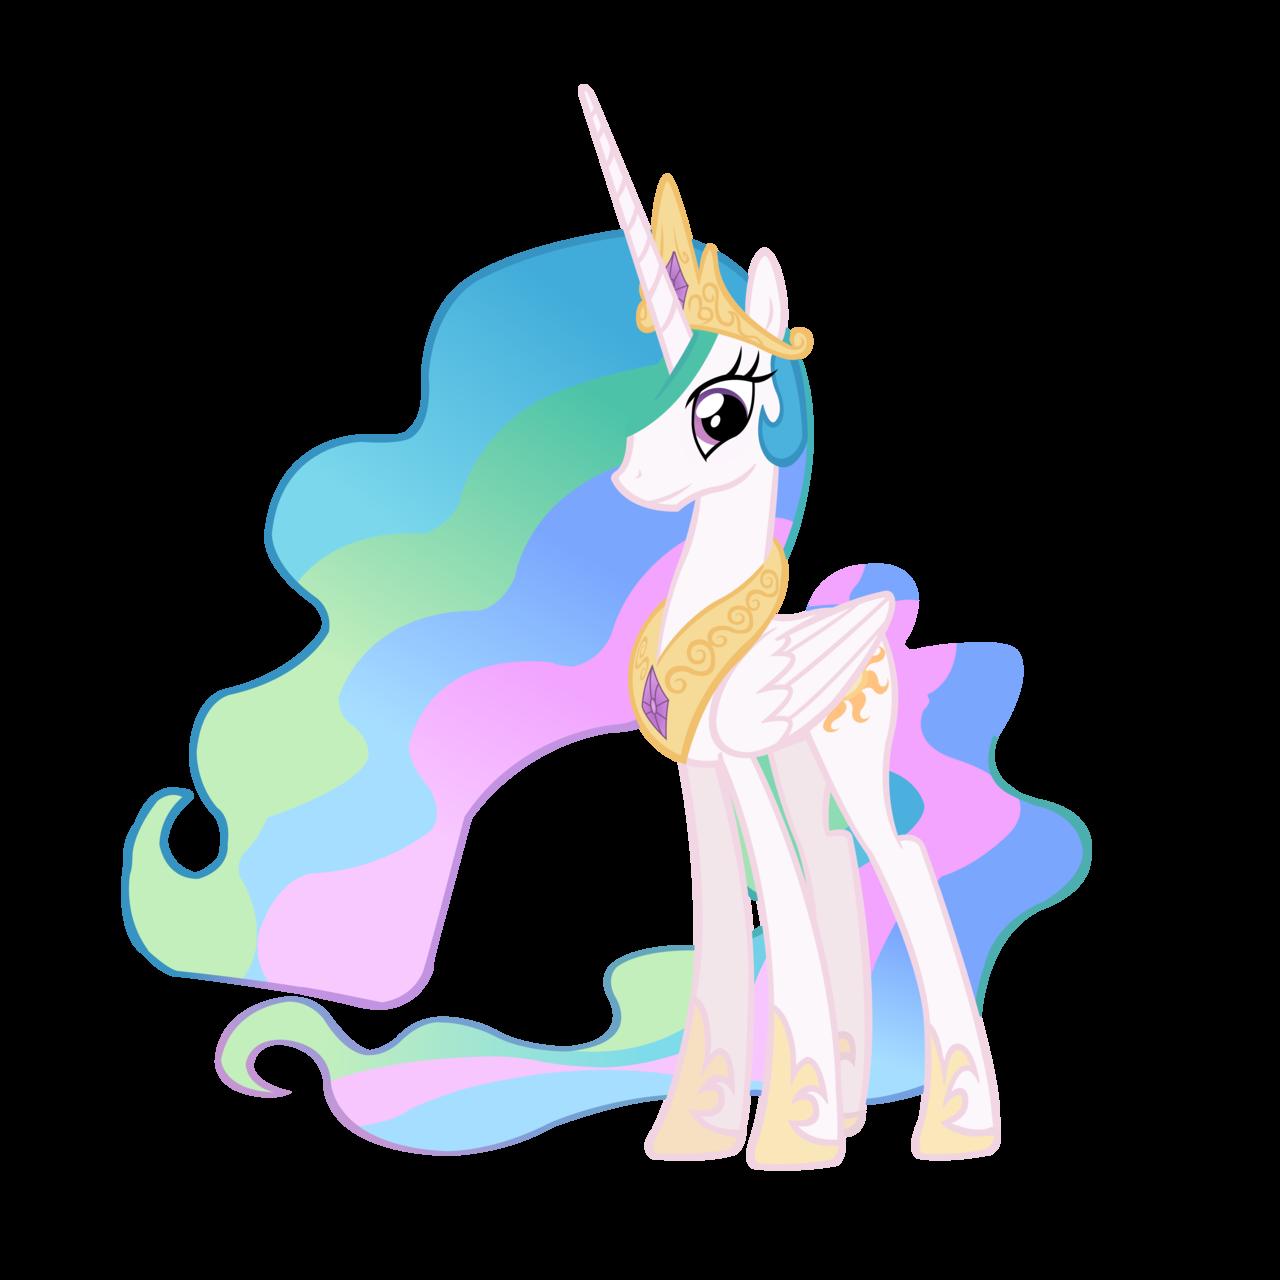 Princess Celestia My Little Pony Infinite Loops Wiki